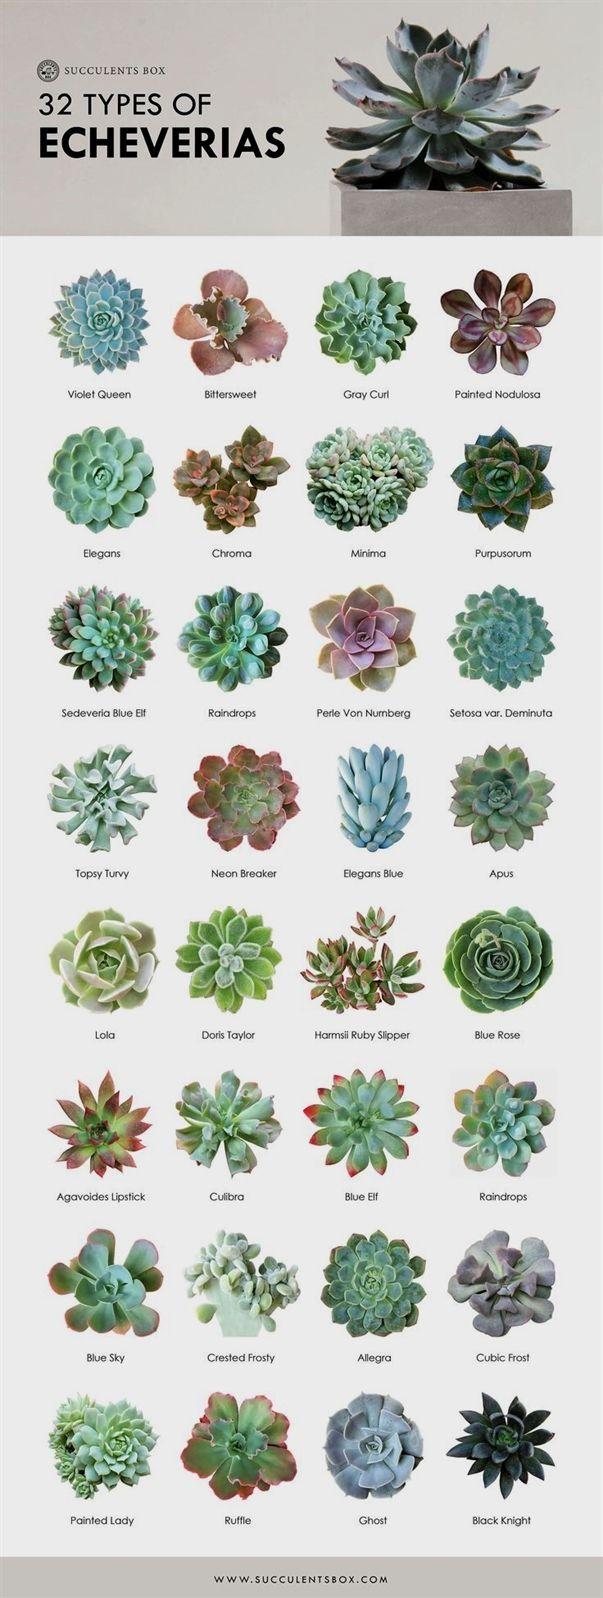 206e1f6a88dcc9a5654d356f31a07330 - Where Can I Buy Gardening Supplies Near Me